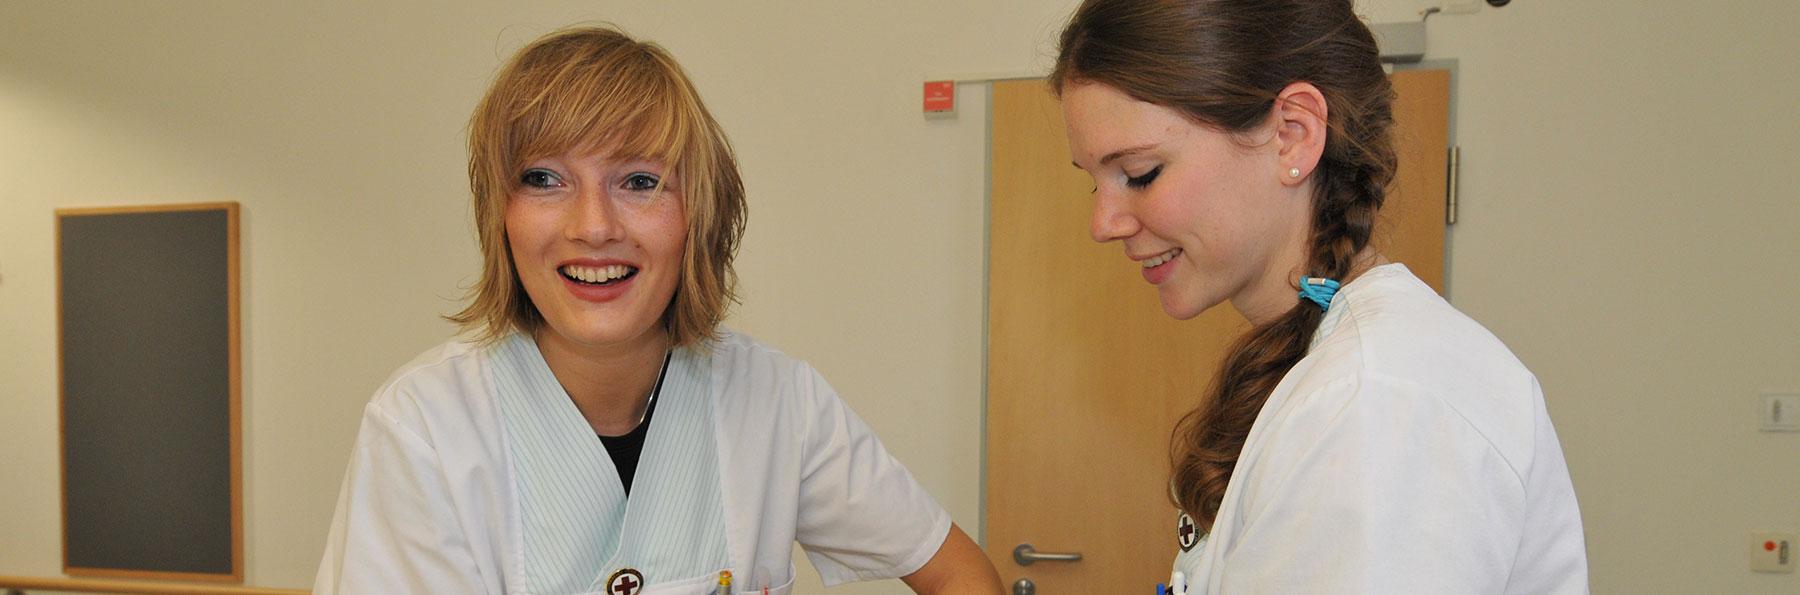 Ausbildung Krankenpflegehilfe (KPH)